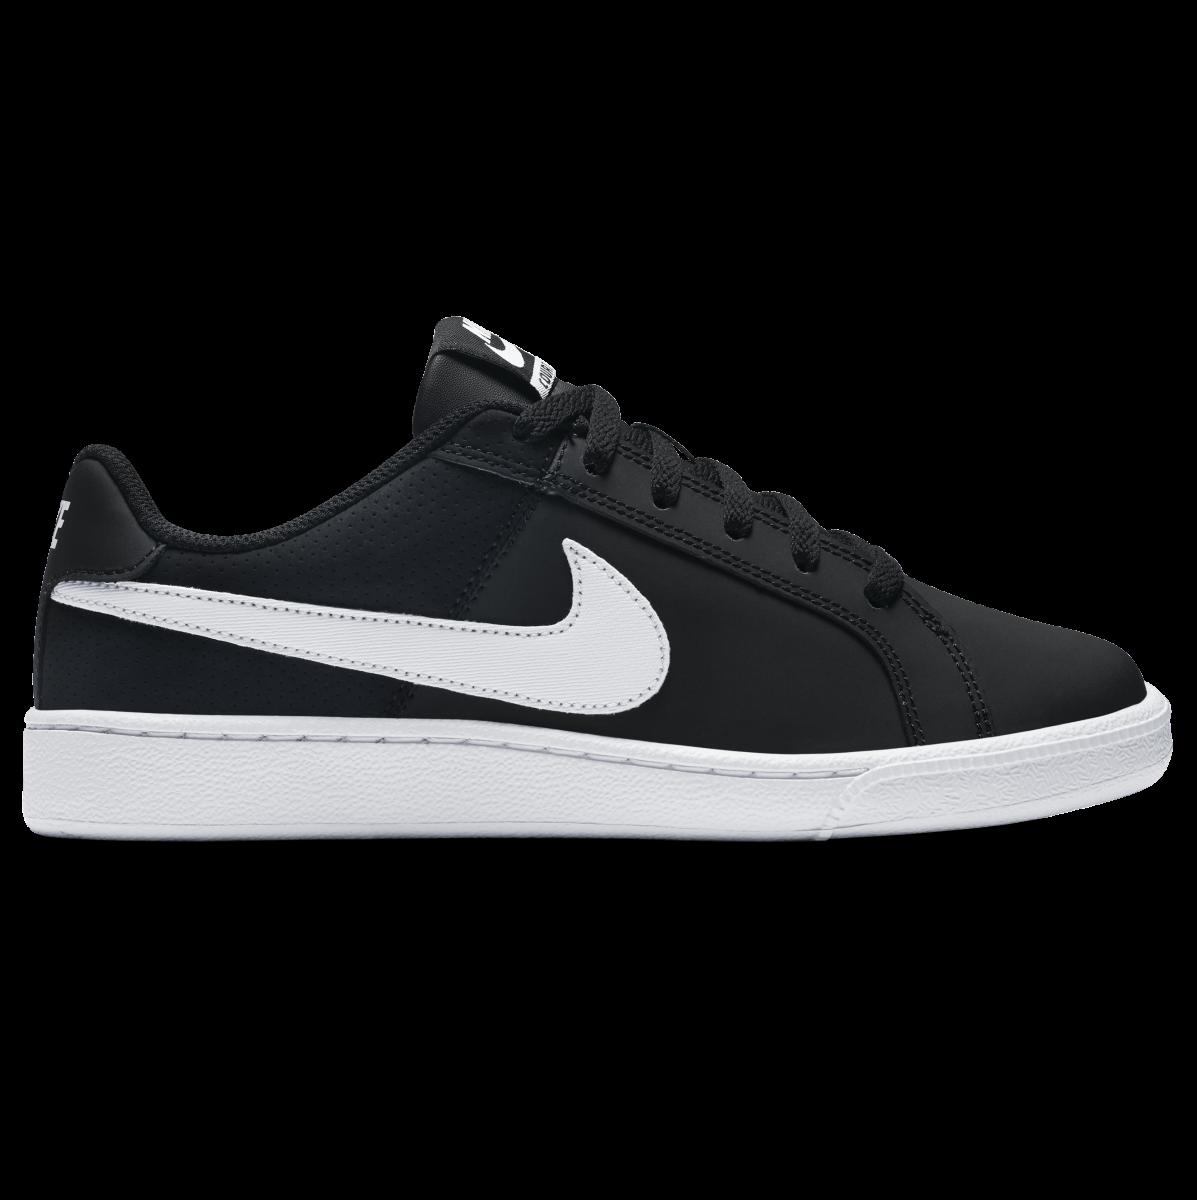 0e407223d8 Tênis Nike Court Royale Feminino 749867-010 - Preto Branco - Botas ...